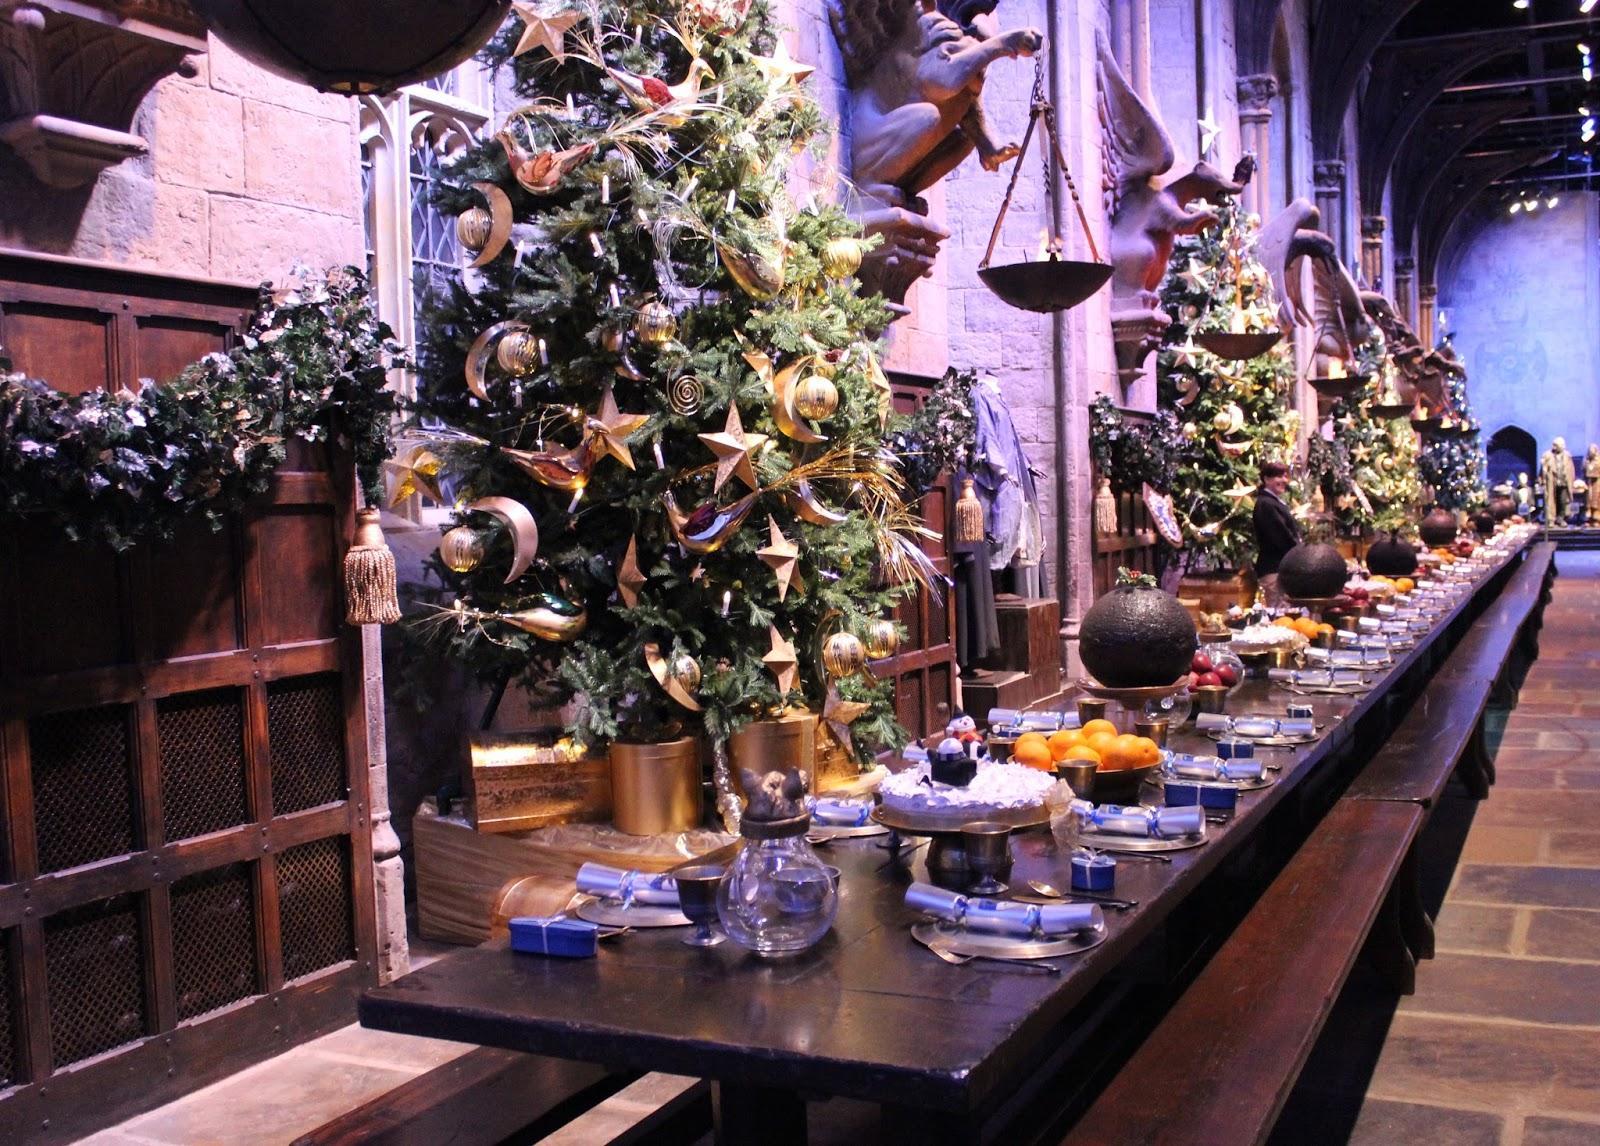 Harry Potter studio tour london great hall food